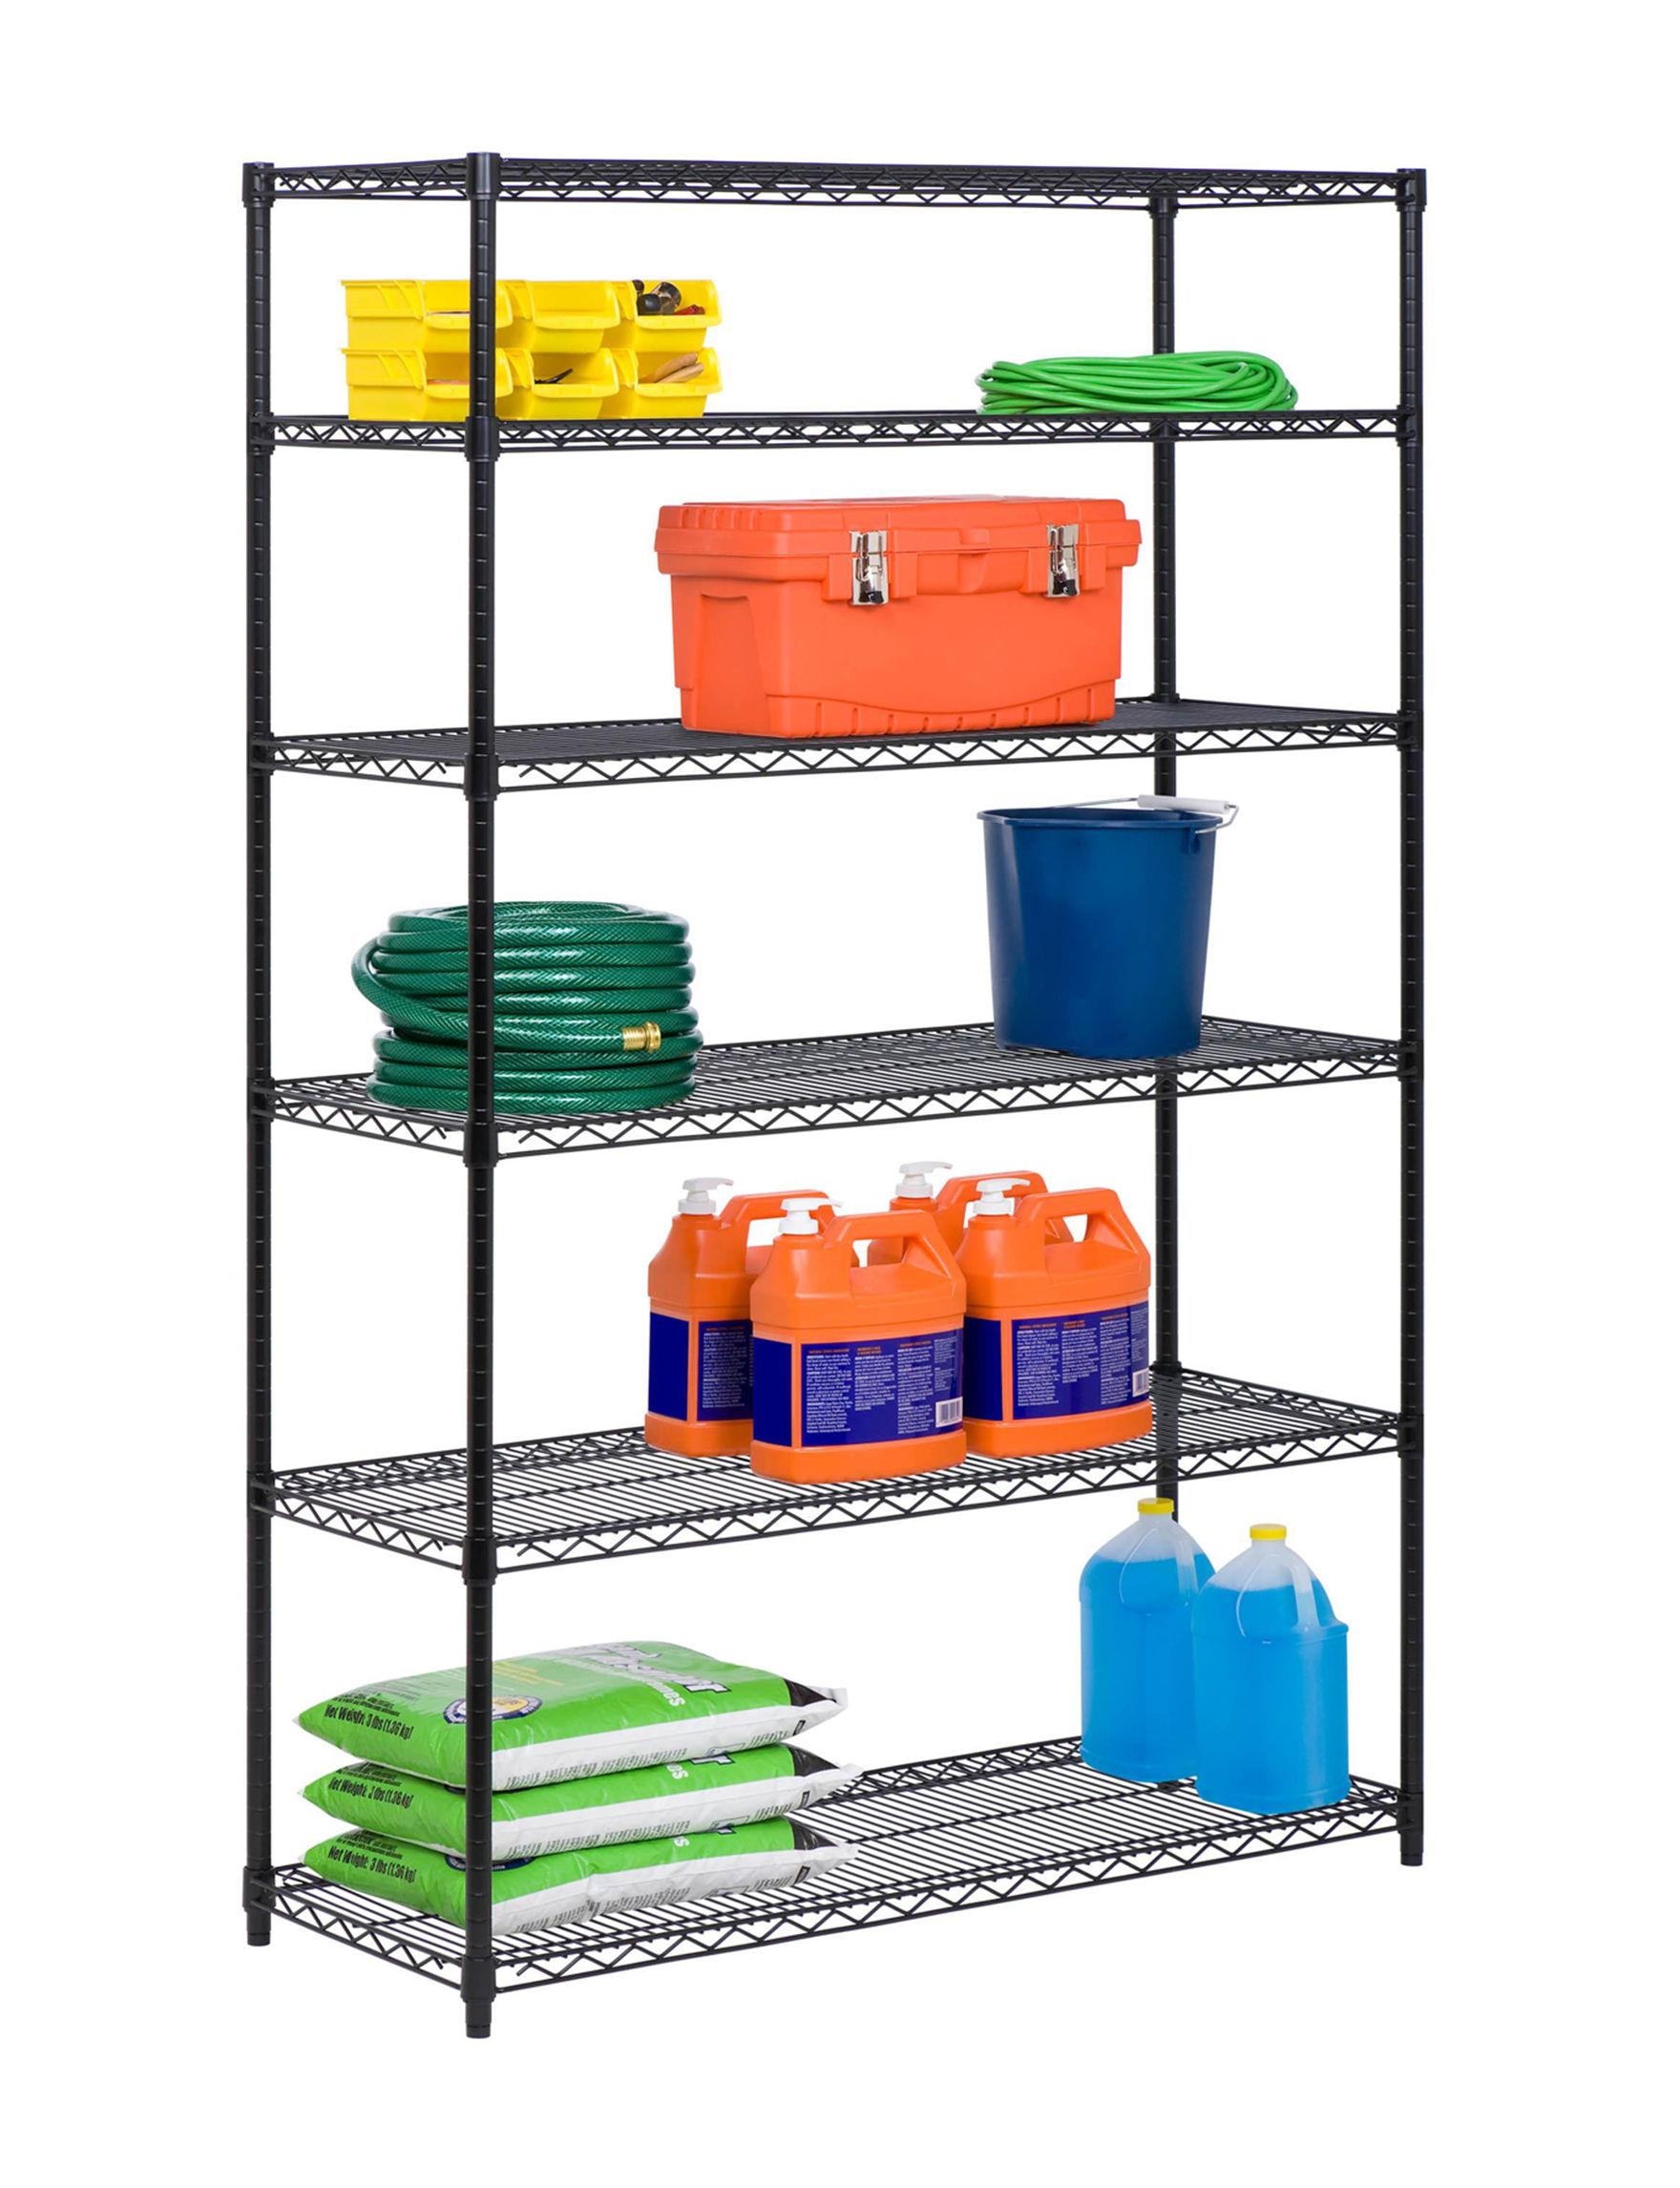 Honey-Can-Do International Black Storage Shelves Storage & Organization